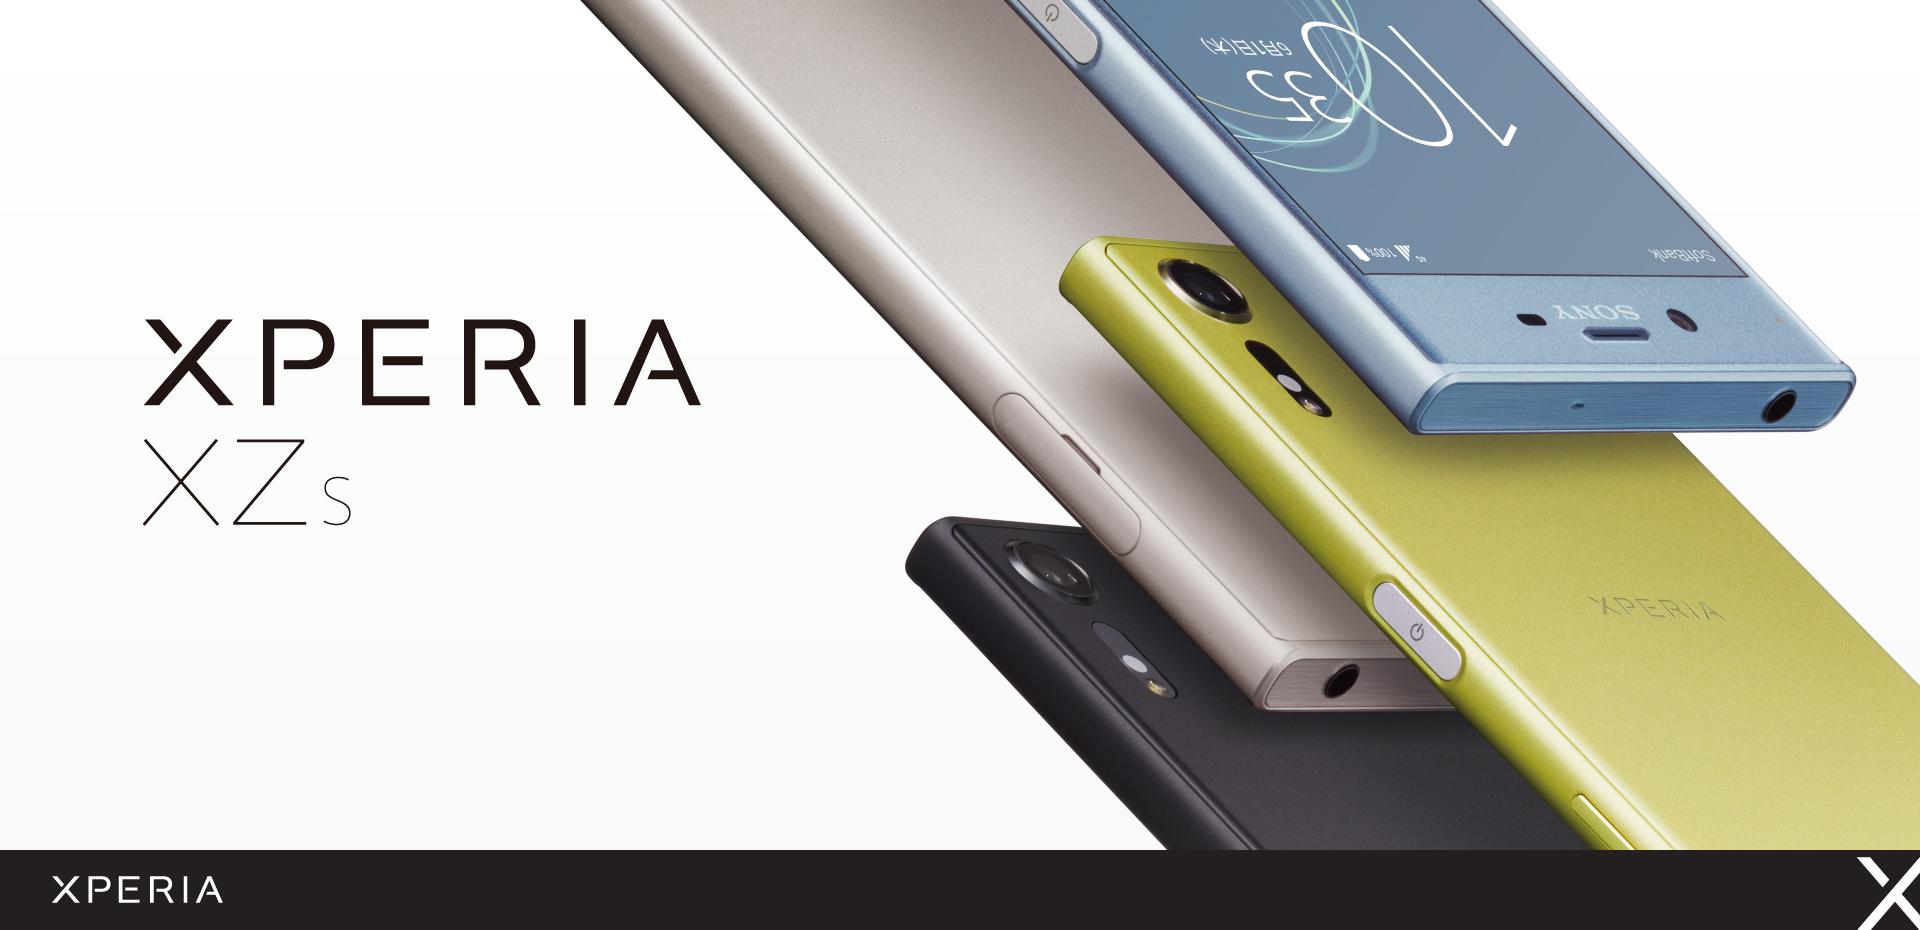 SoftBank Xperia™ XZs [2017年5月26日発売予定]